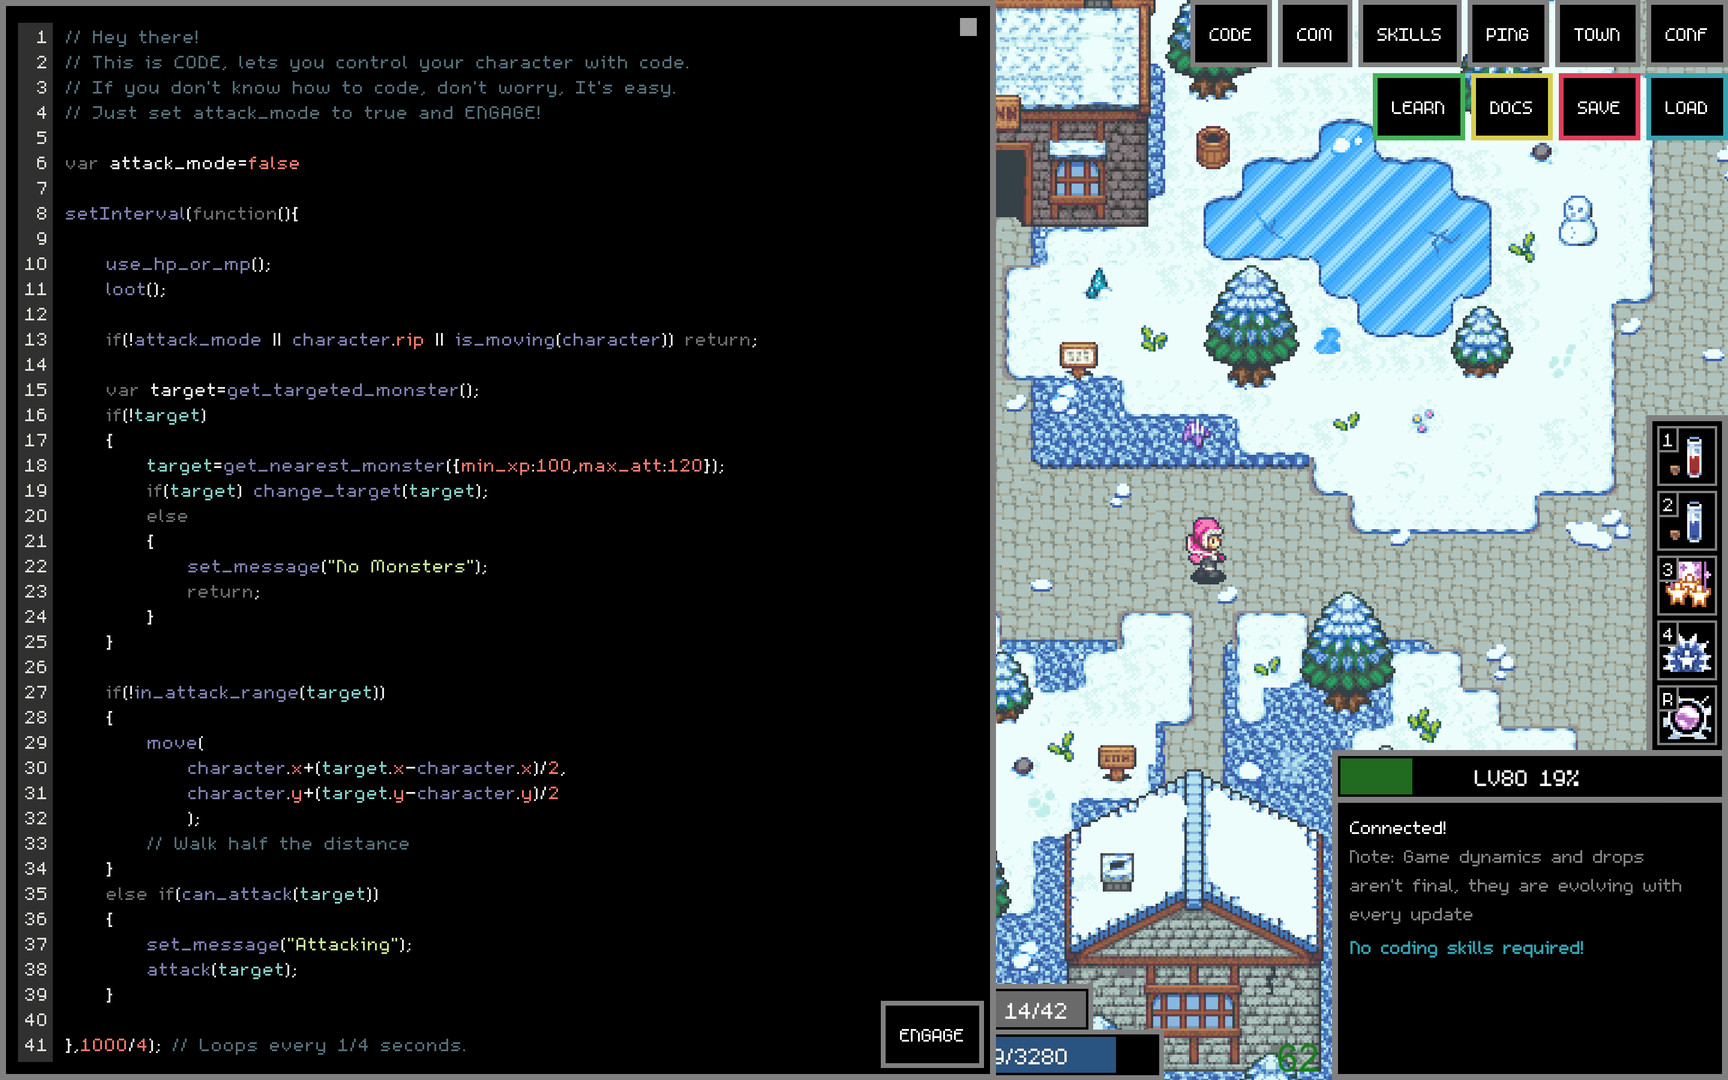 Adventure Land - The Code MMORPG